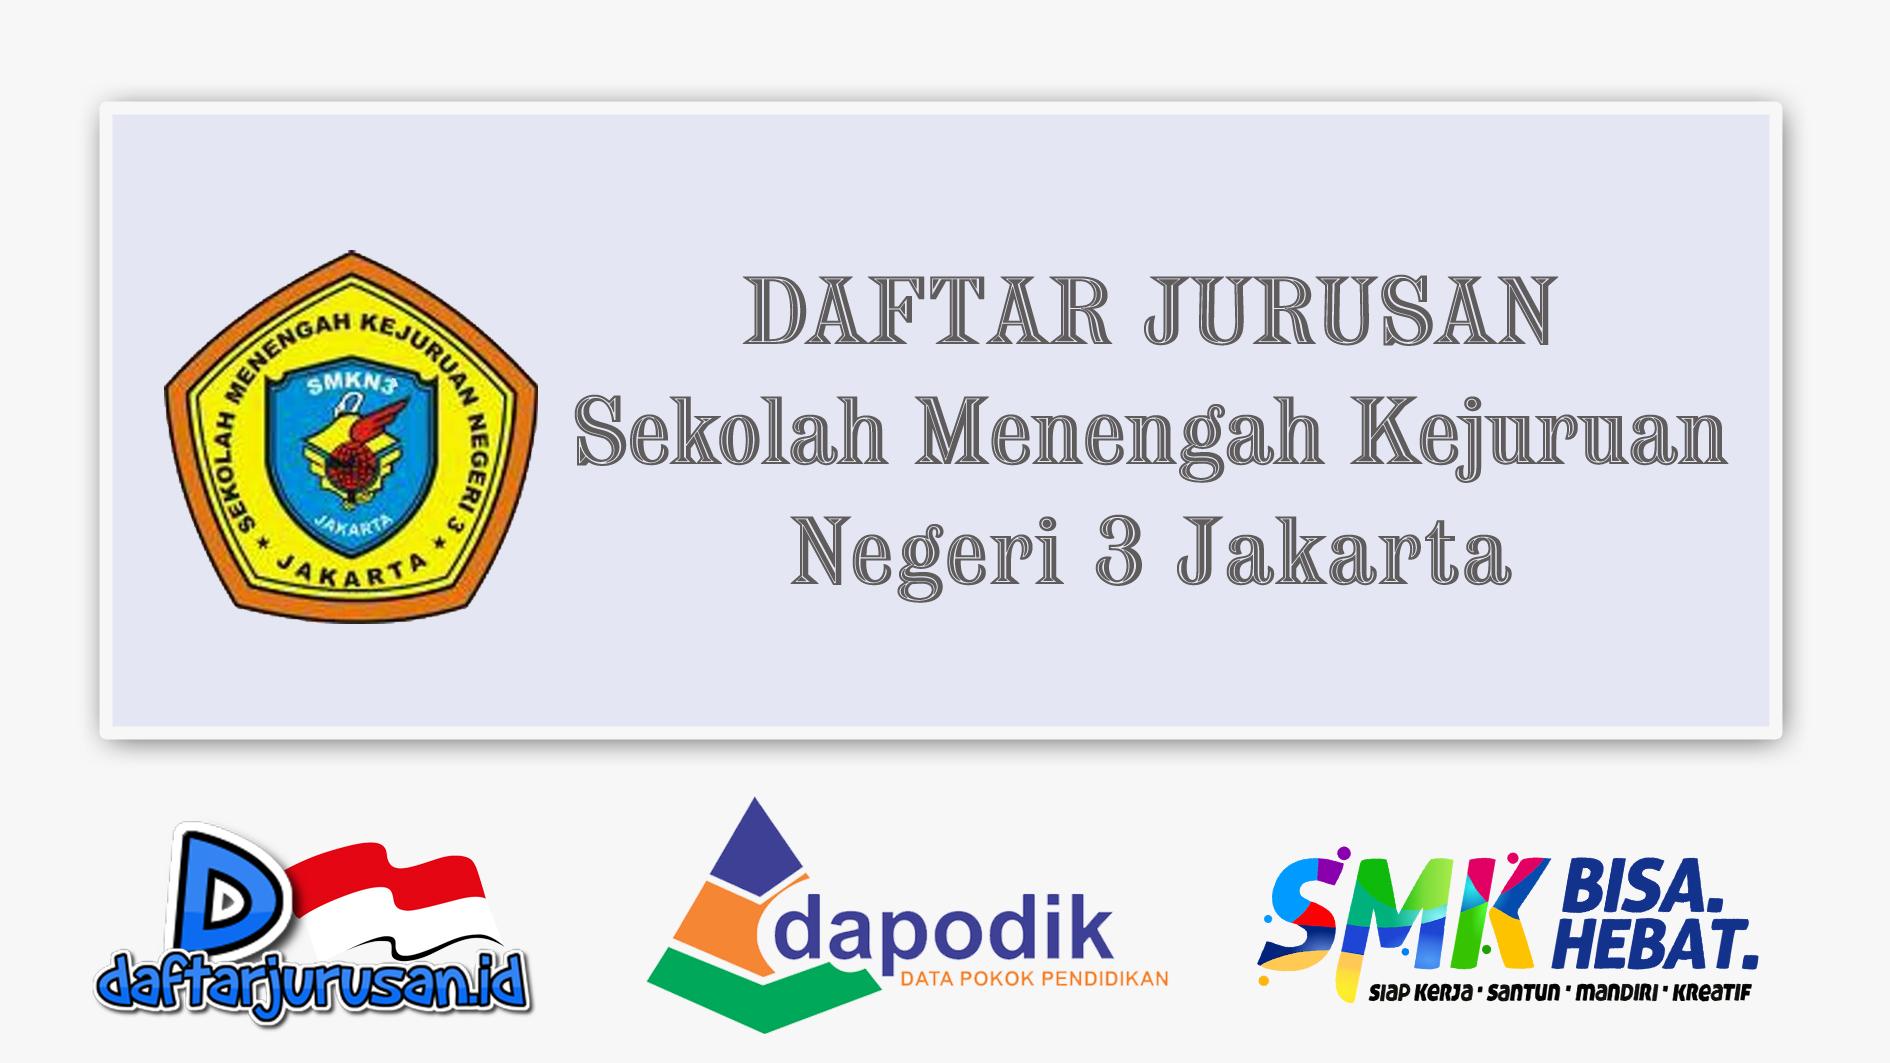 Daftar Jurusan SMK Negeri 3 Jakarta Pusat